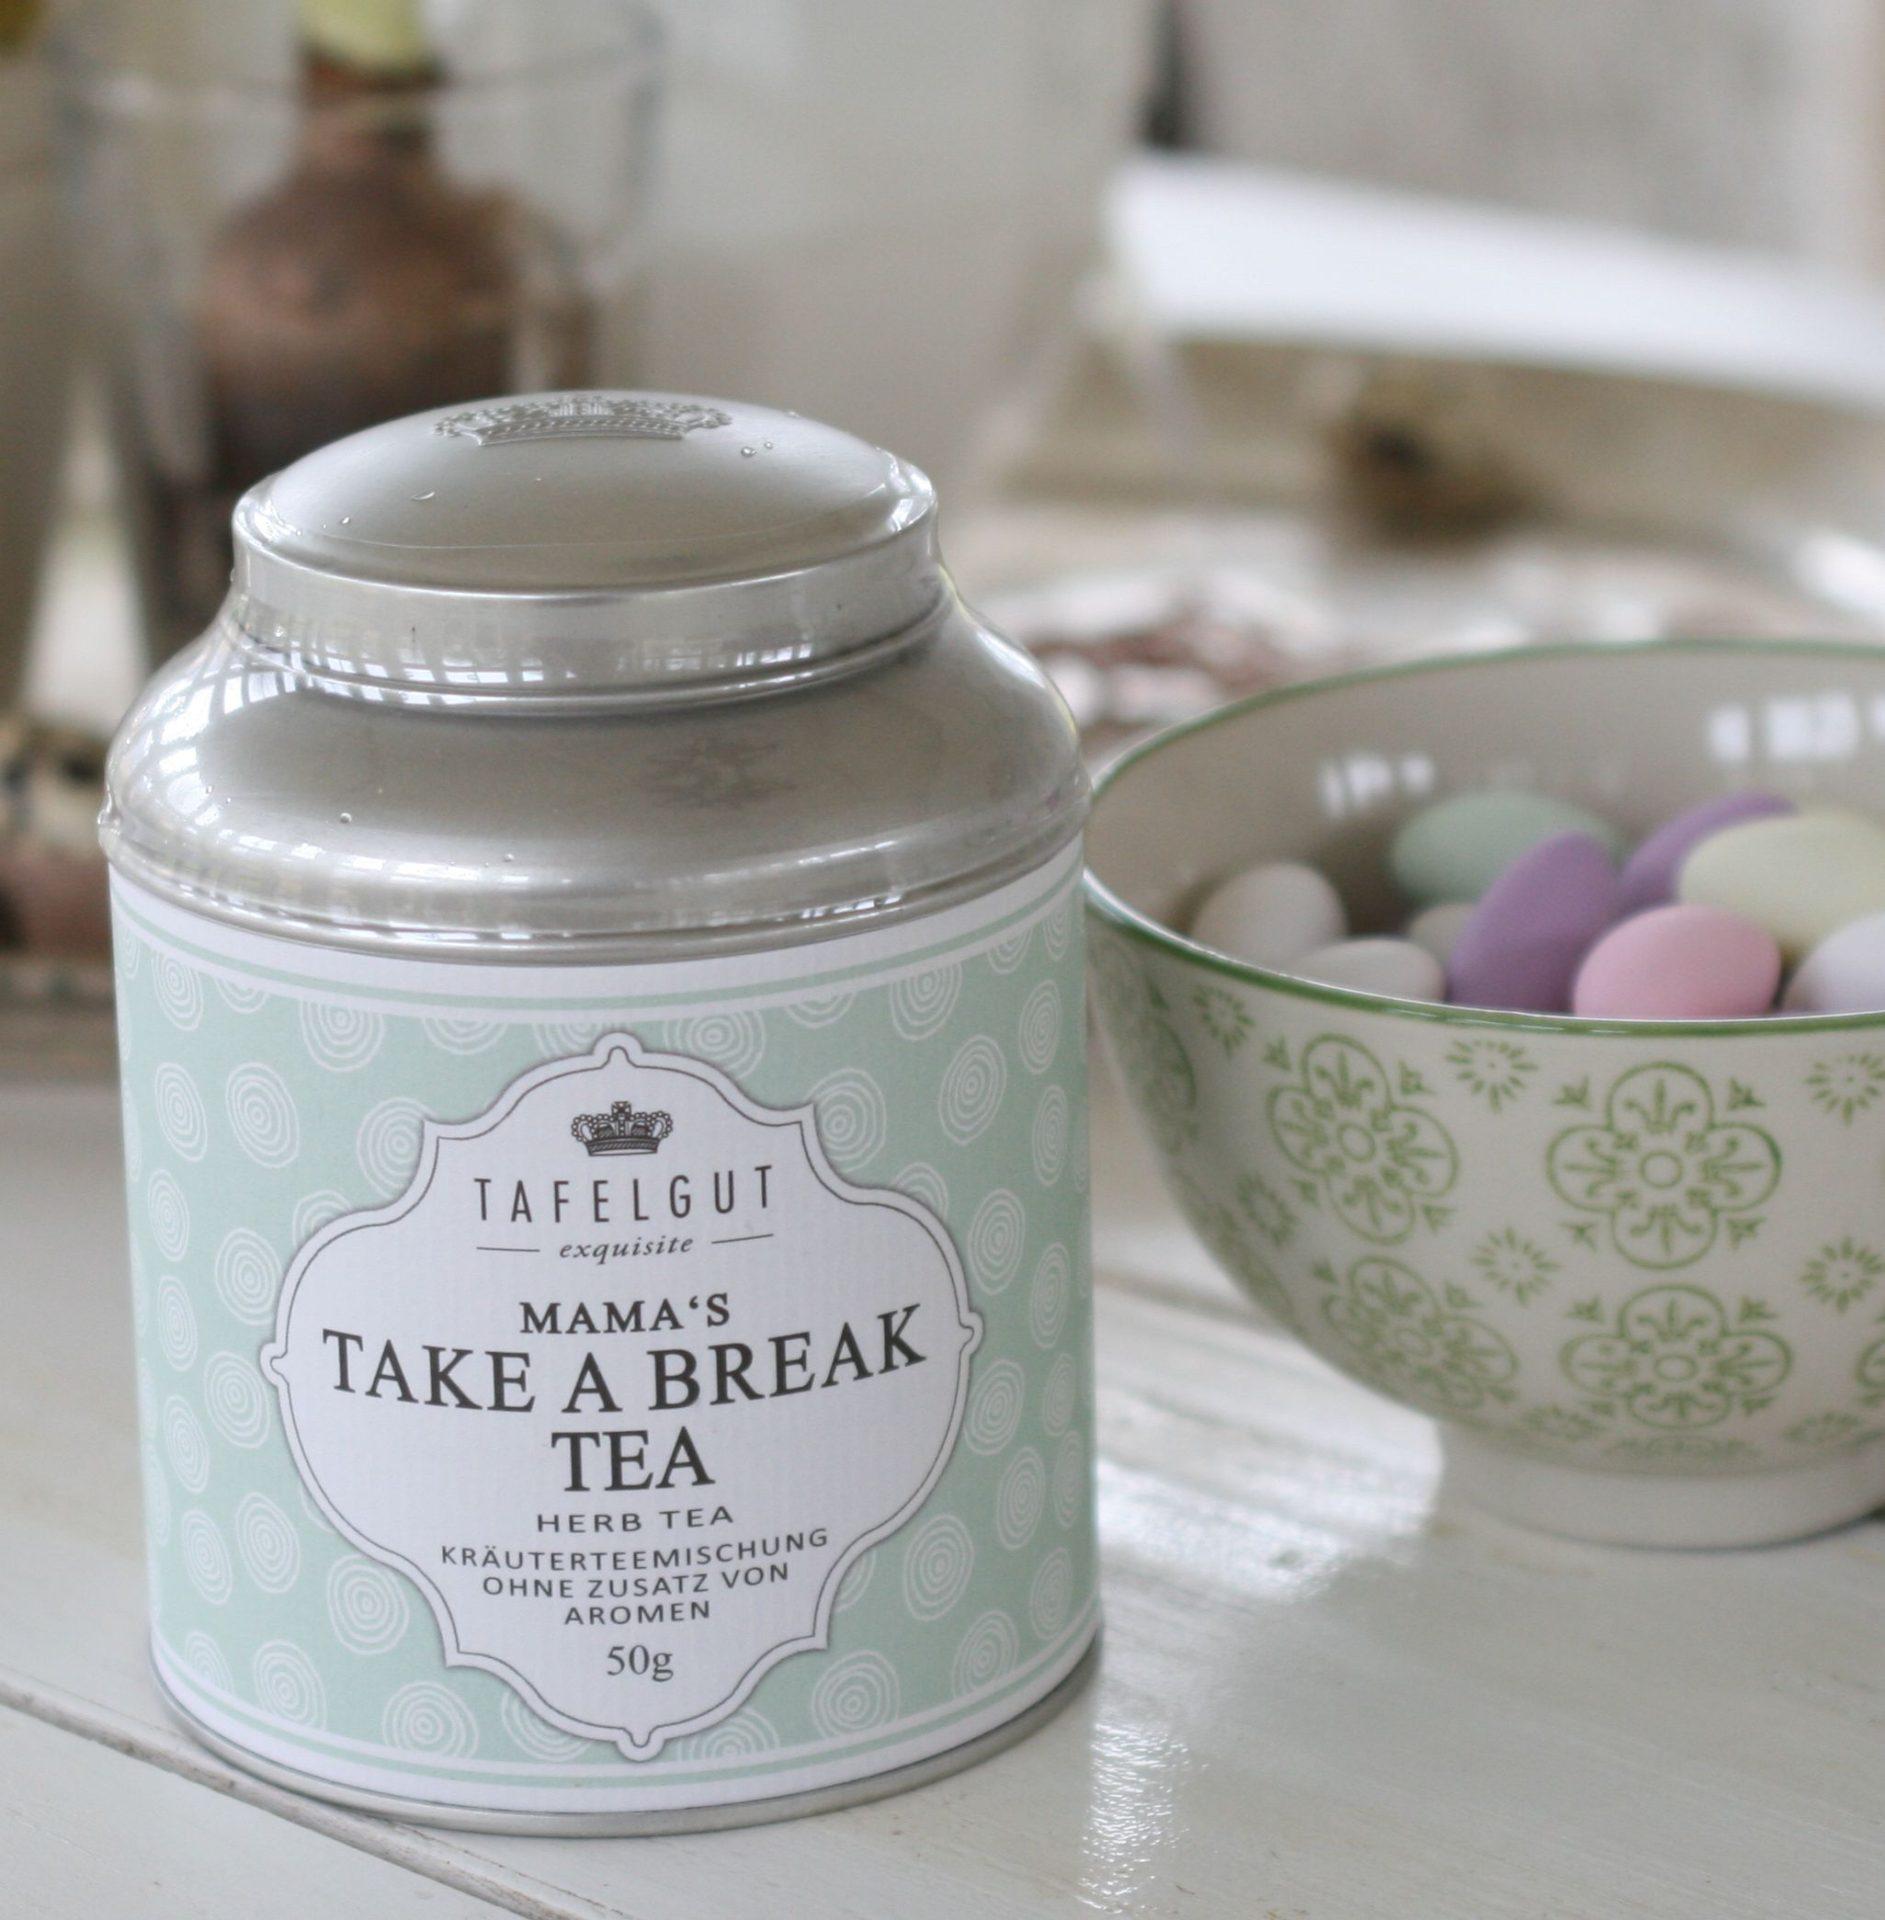 Tafelgut - Mama's take a break tea